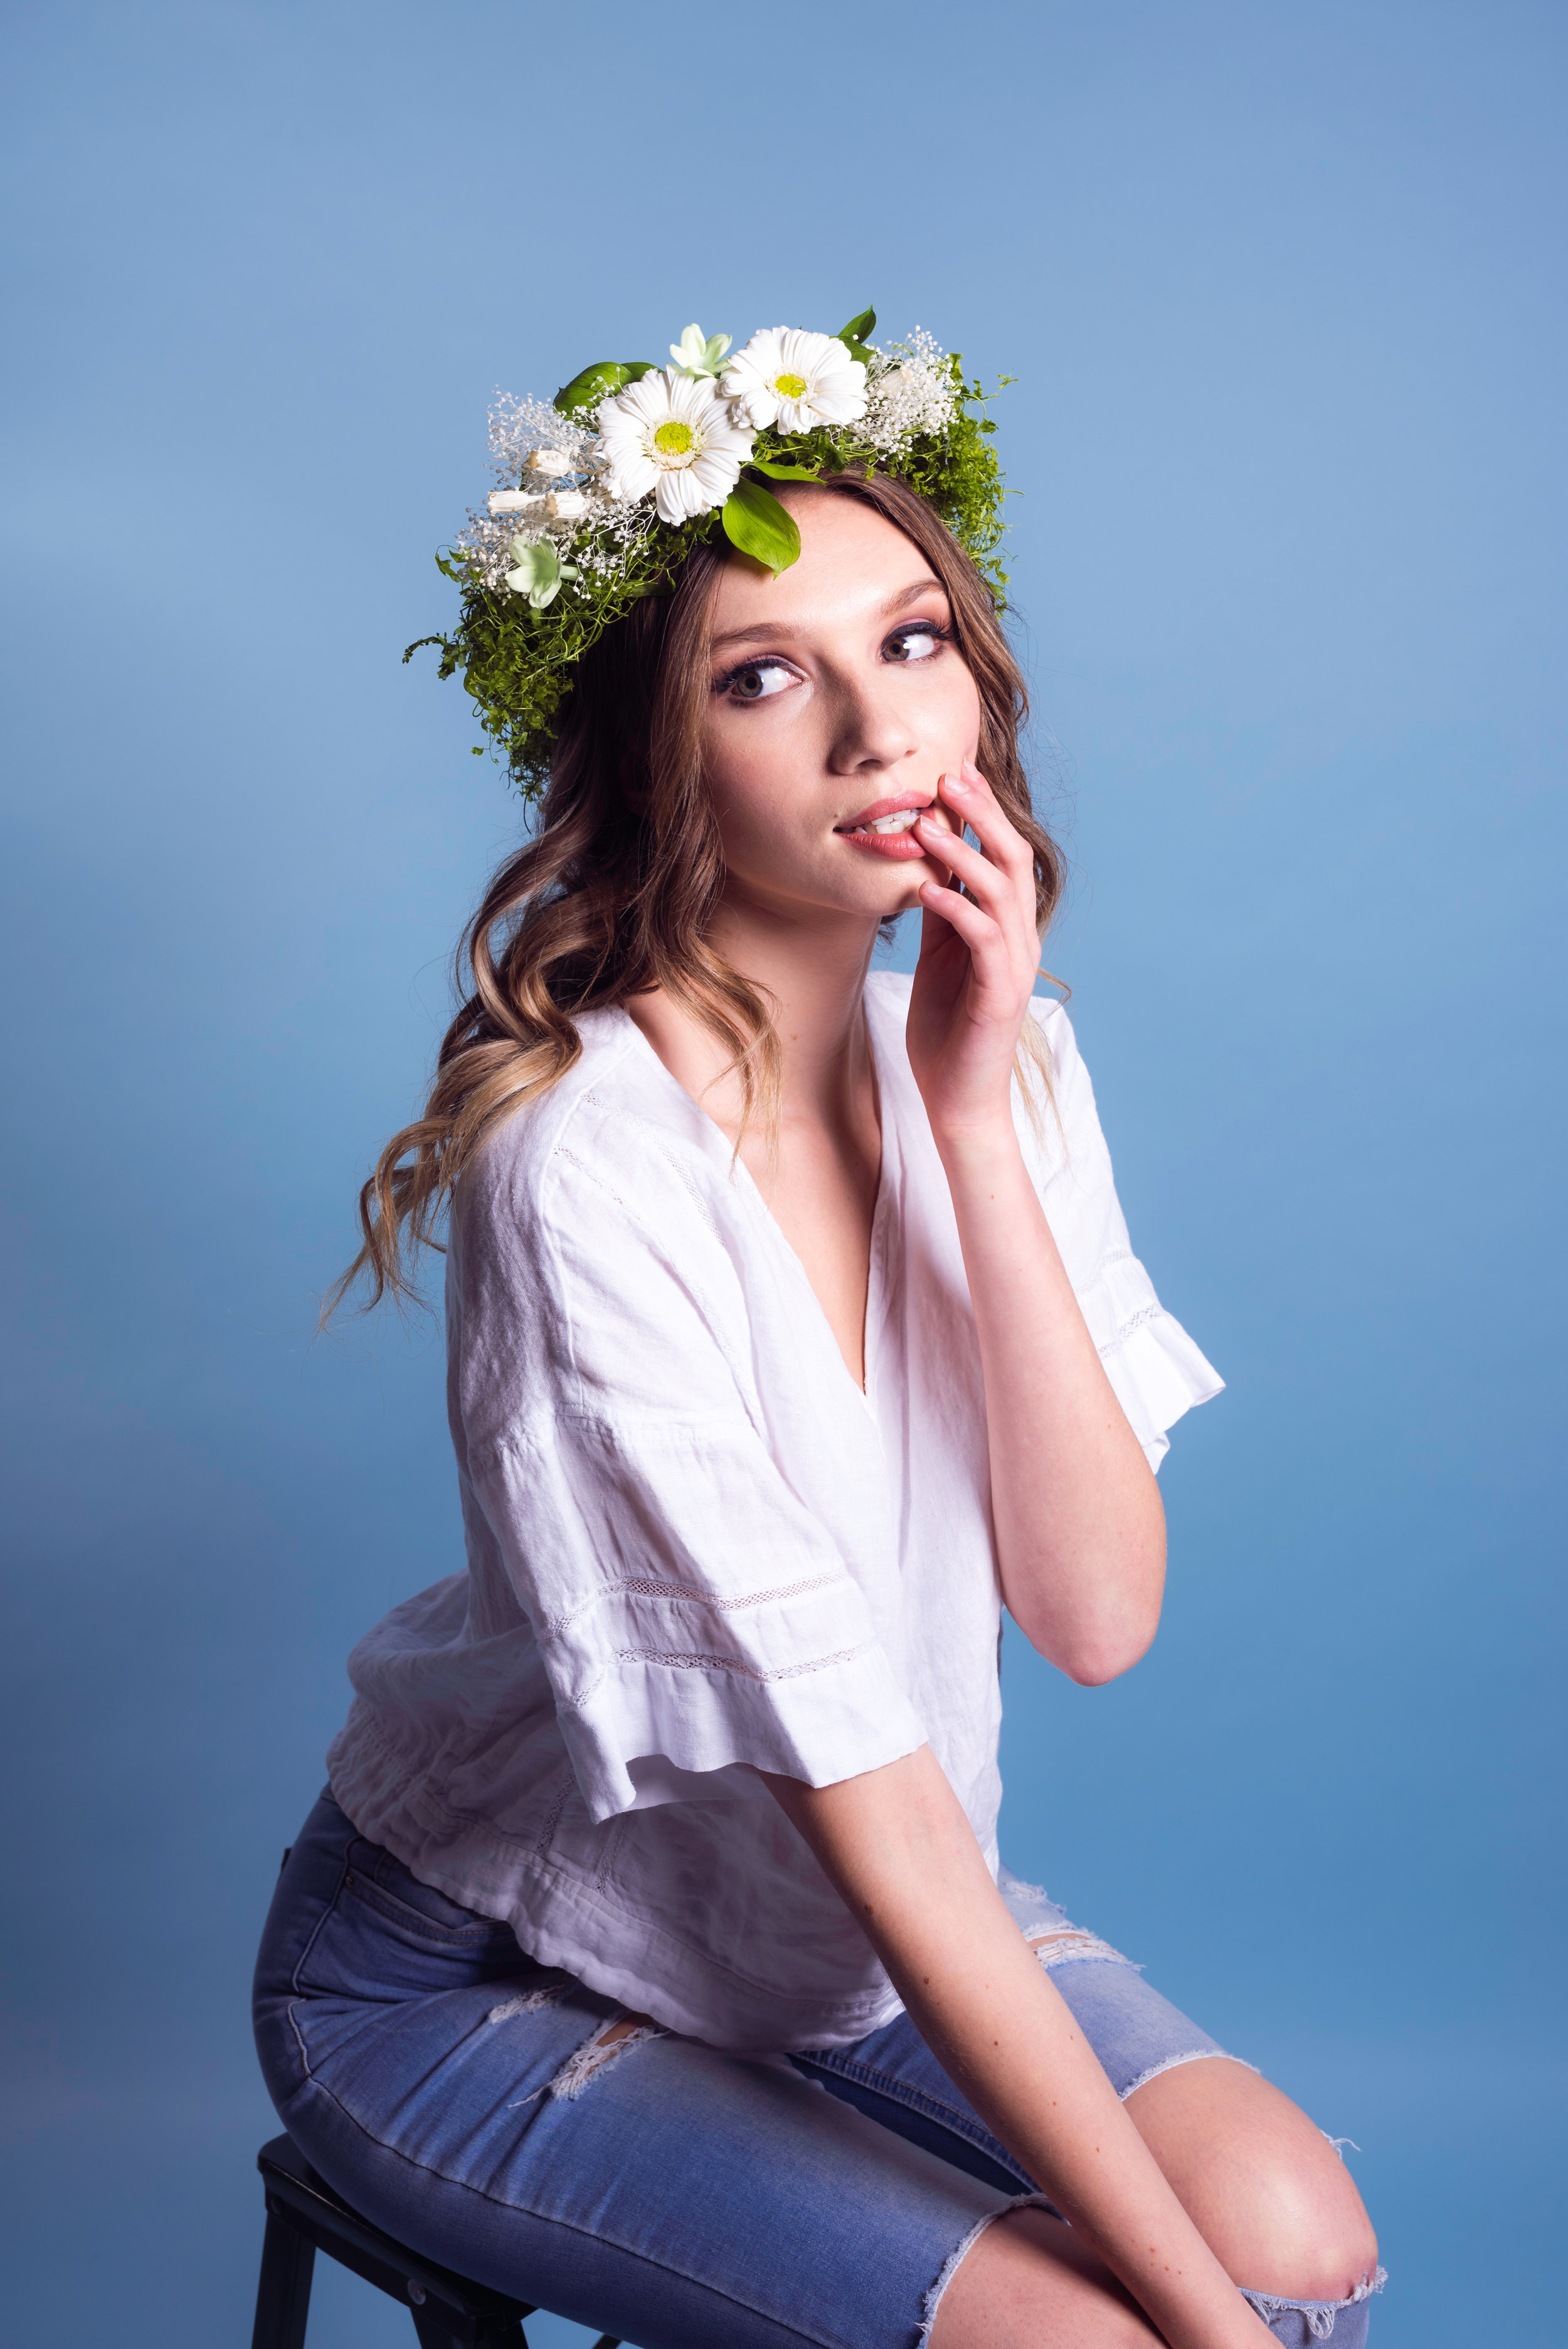 Bloom - Creative